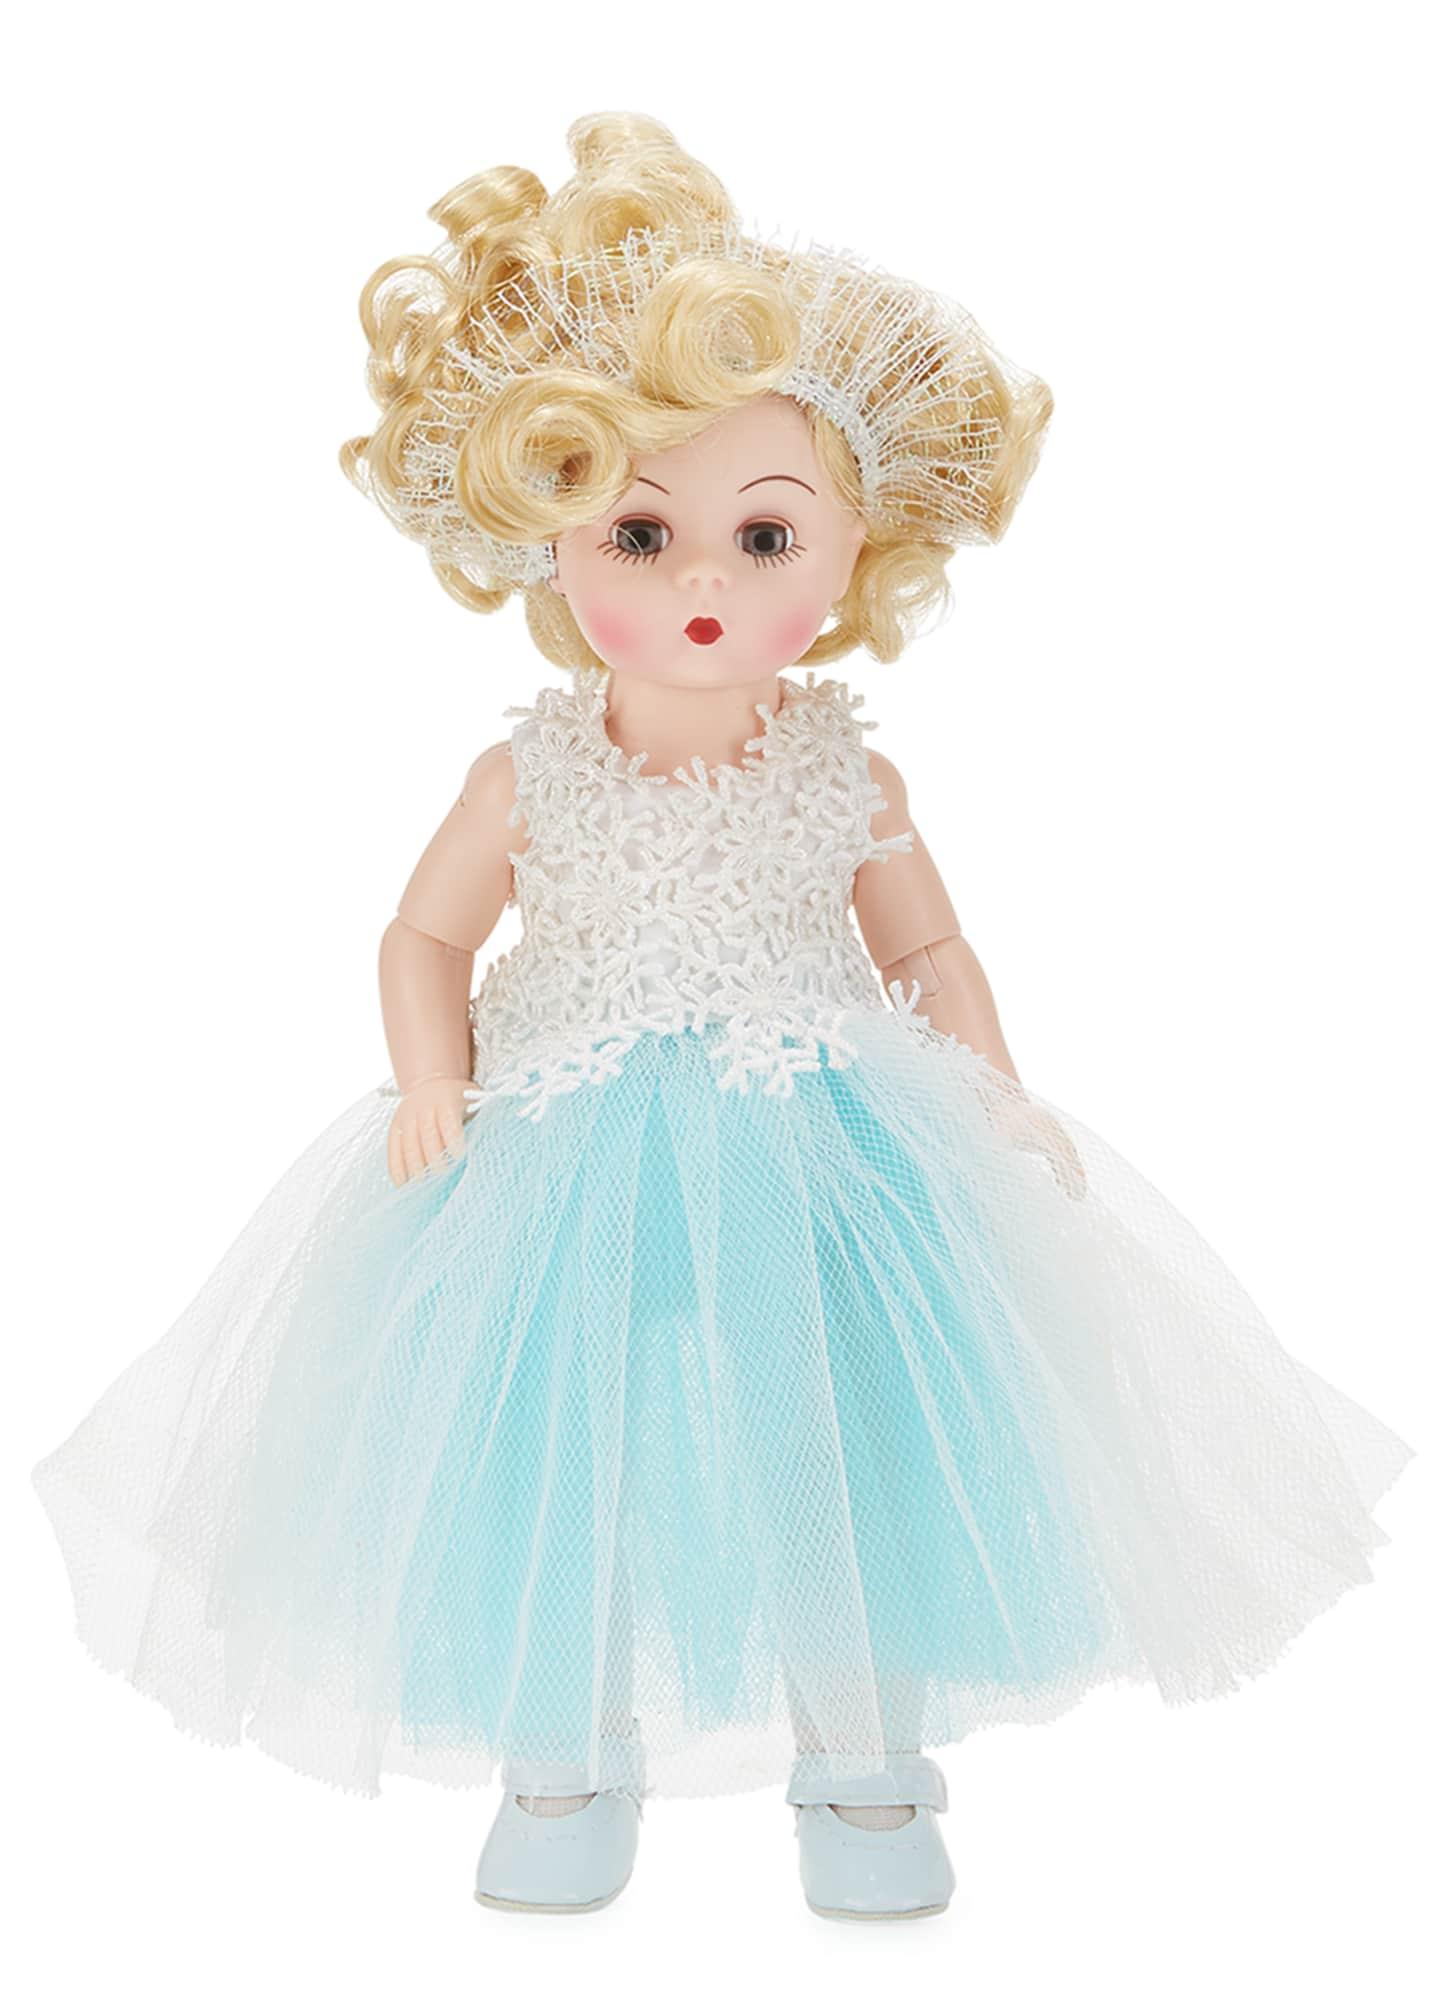 Madame Alexander Dolls Icy Elegance 8